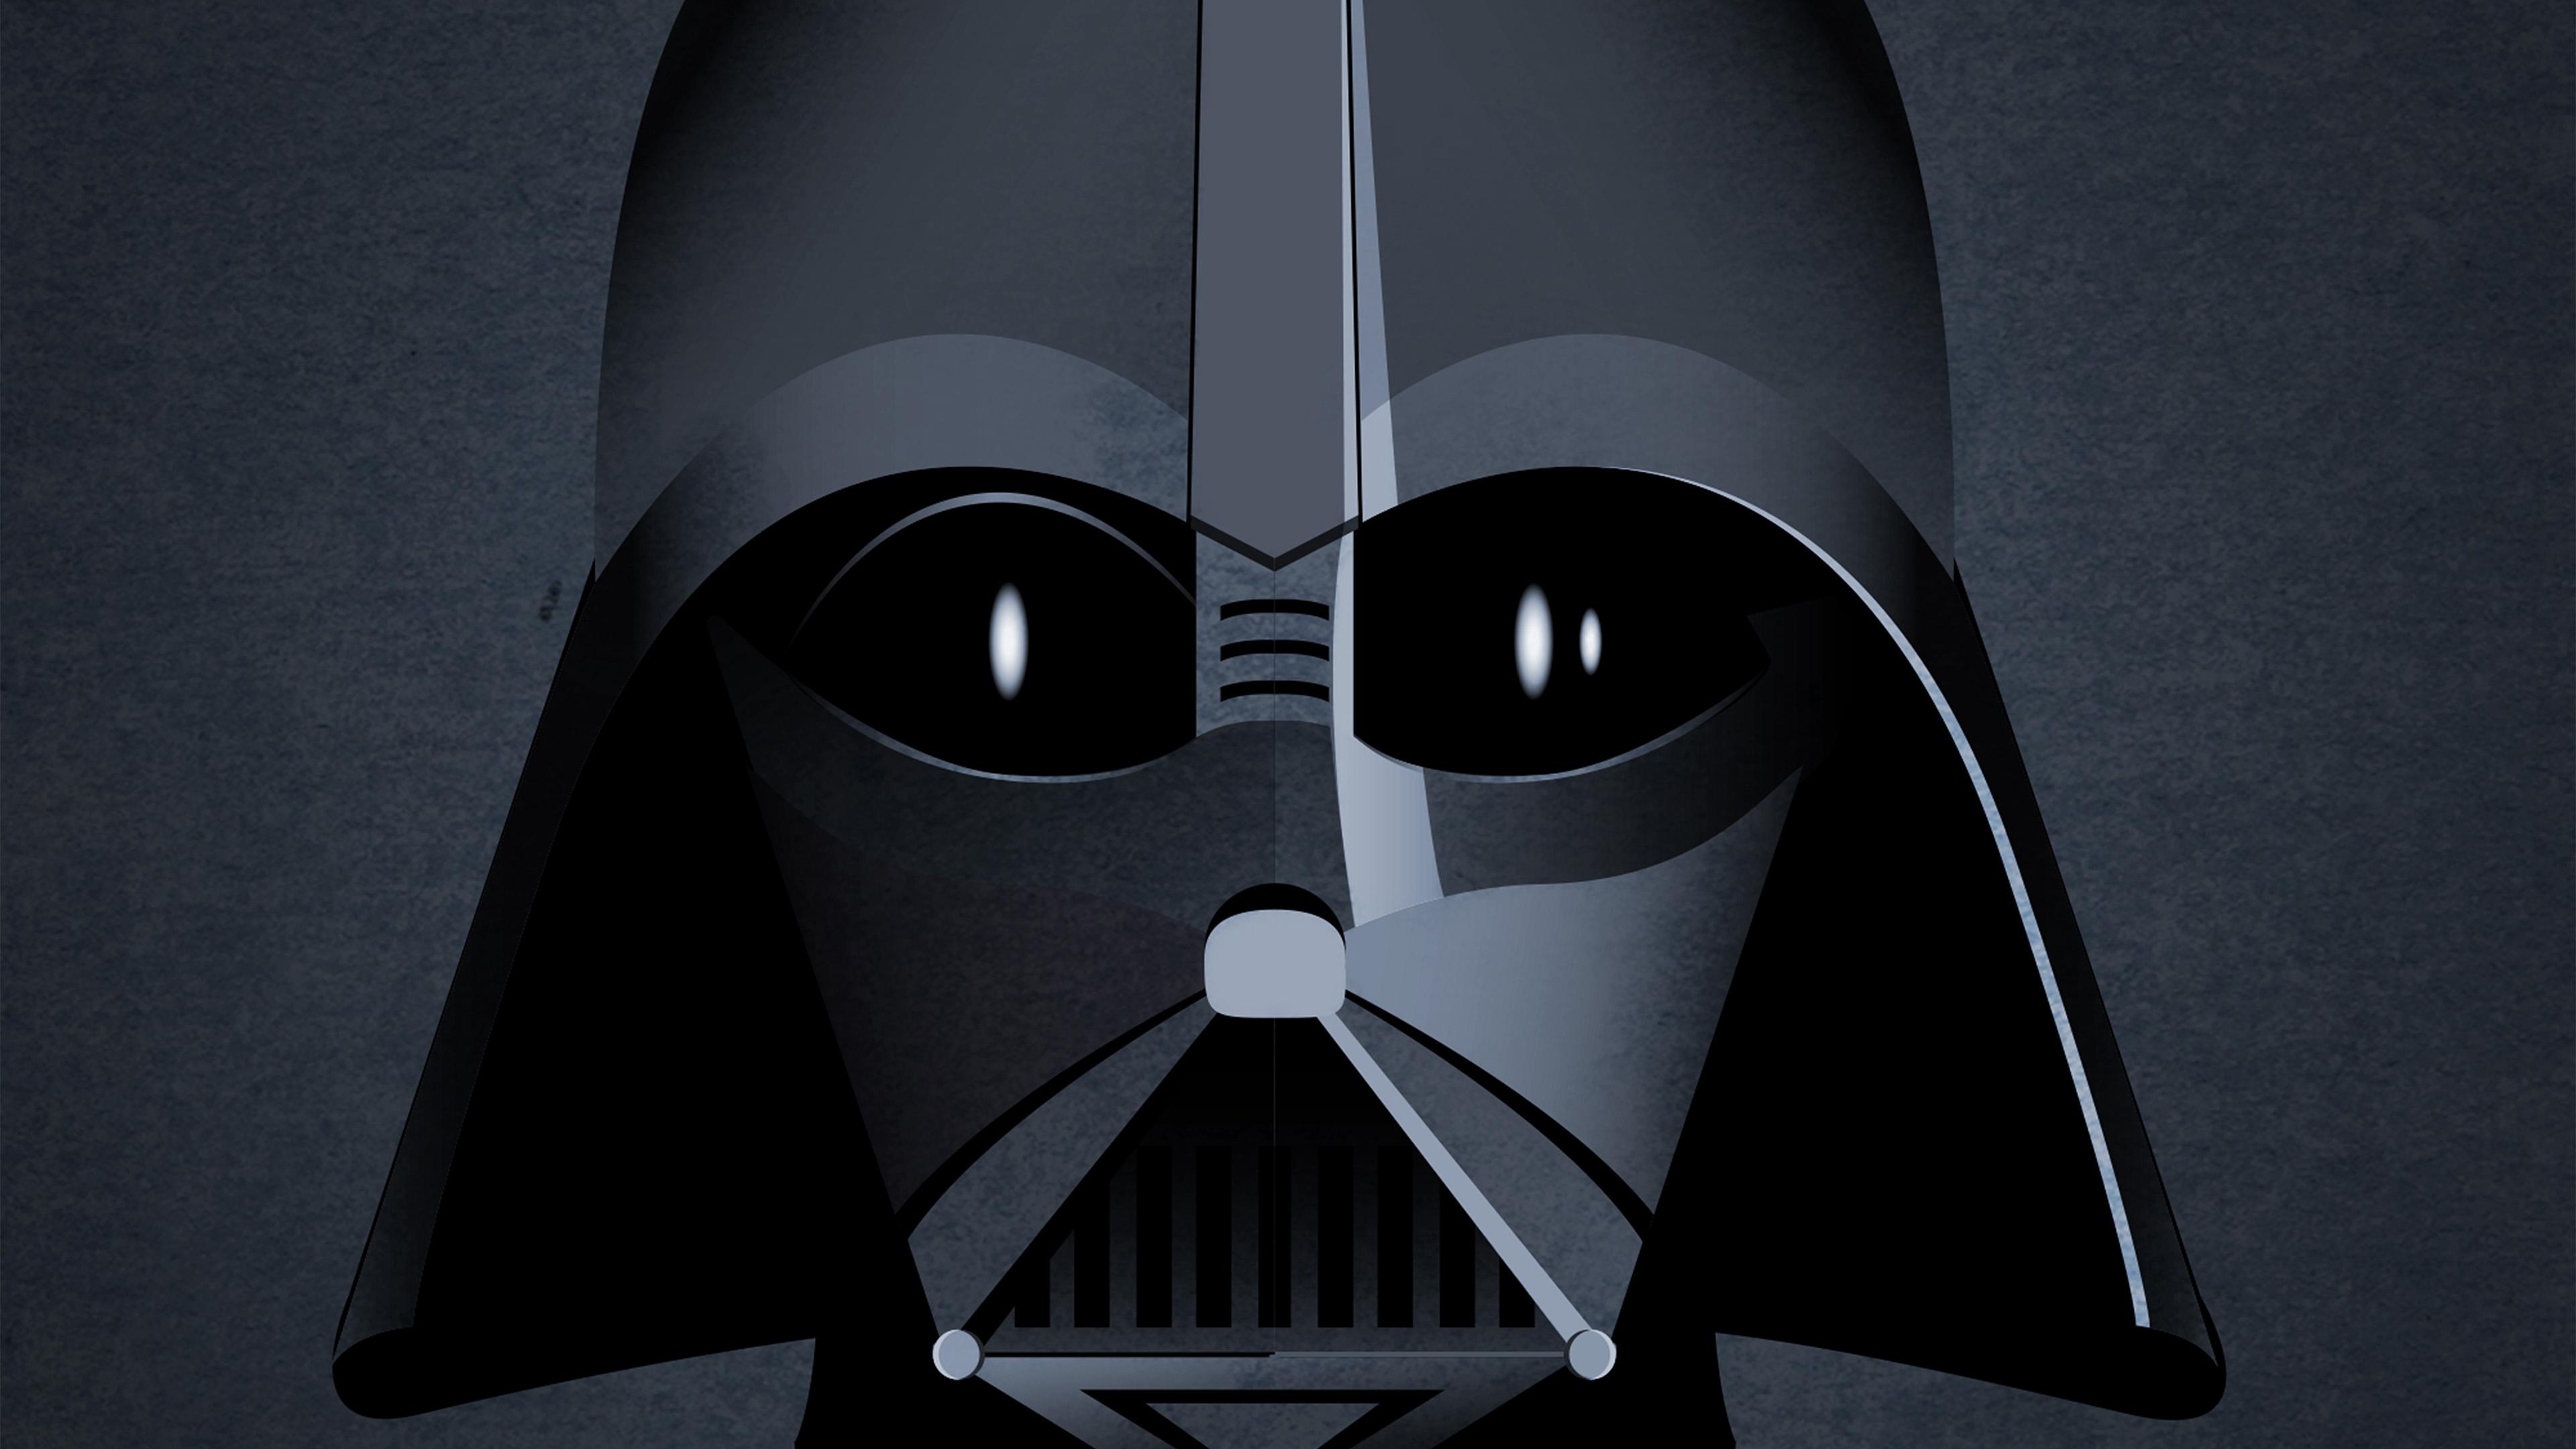 Papers Co Desktop Wallpaper Au27 Starwars Darth Vader Face Dark